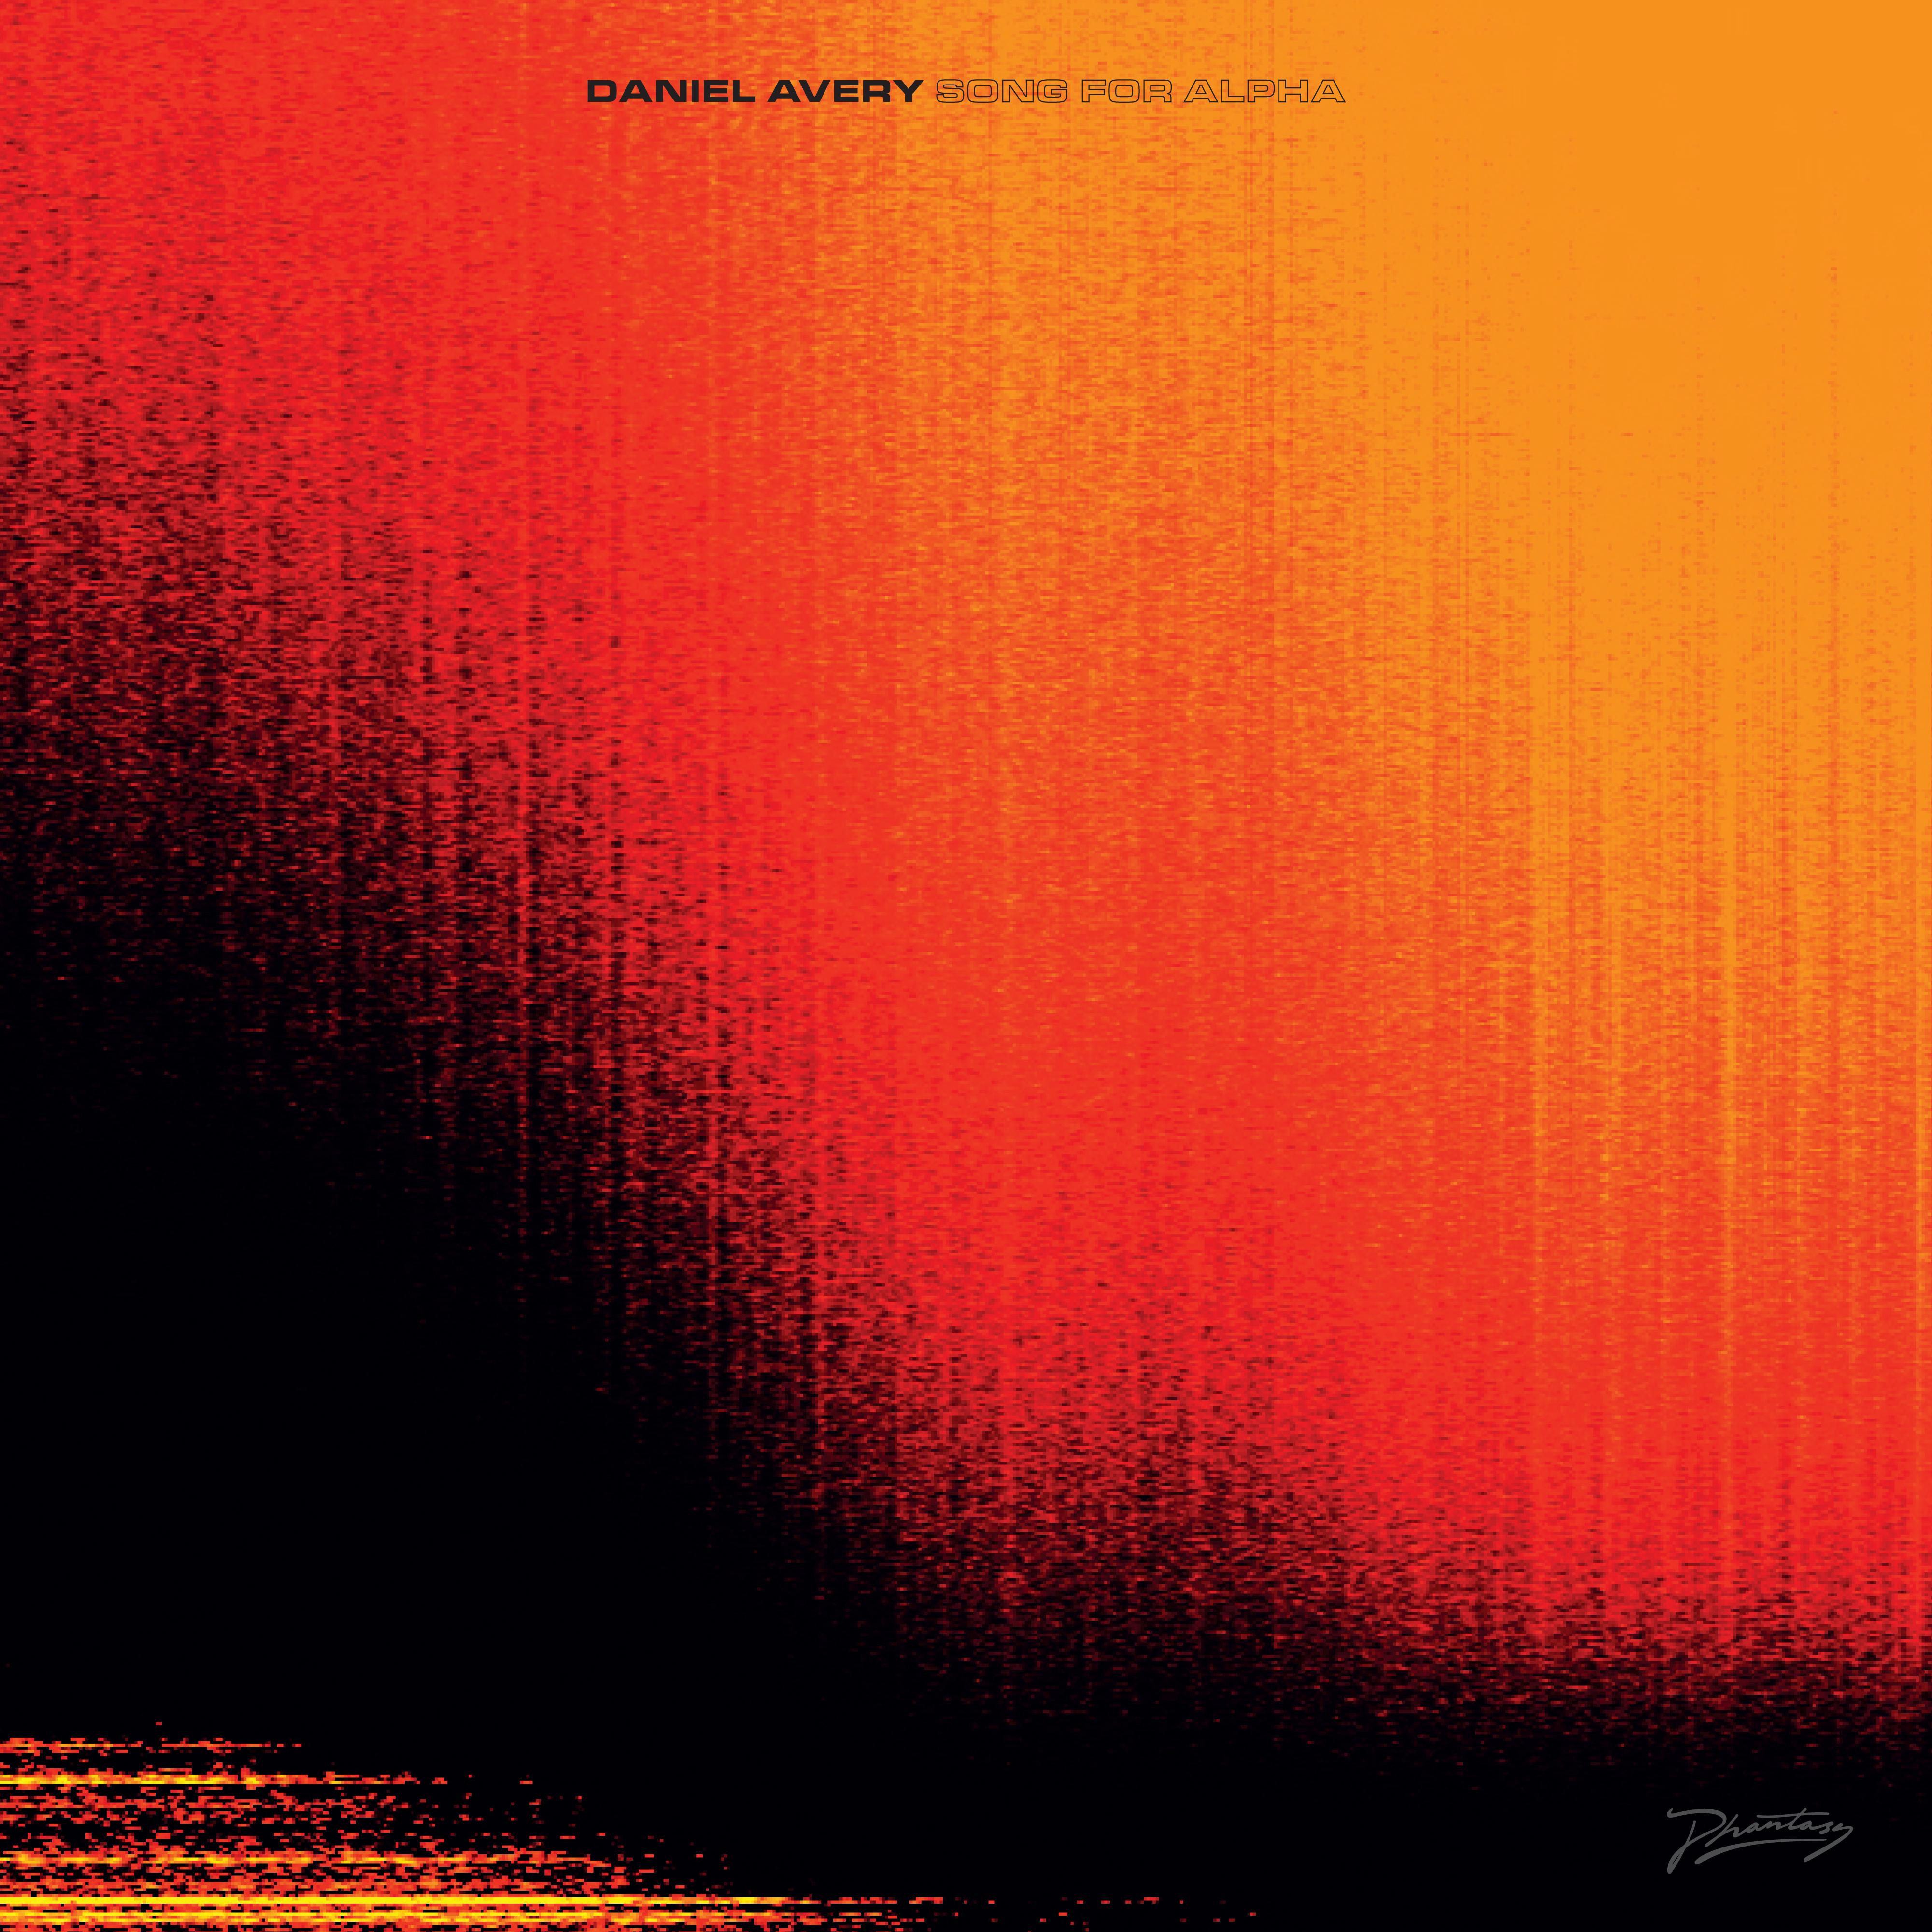 Daniel Avery - Song For Alpha